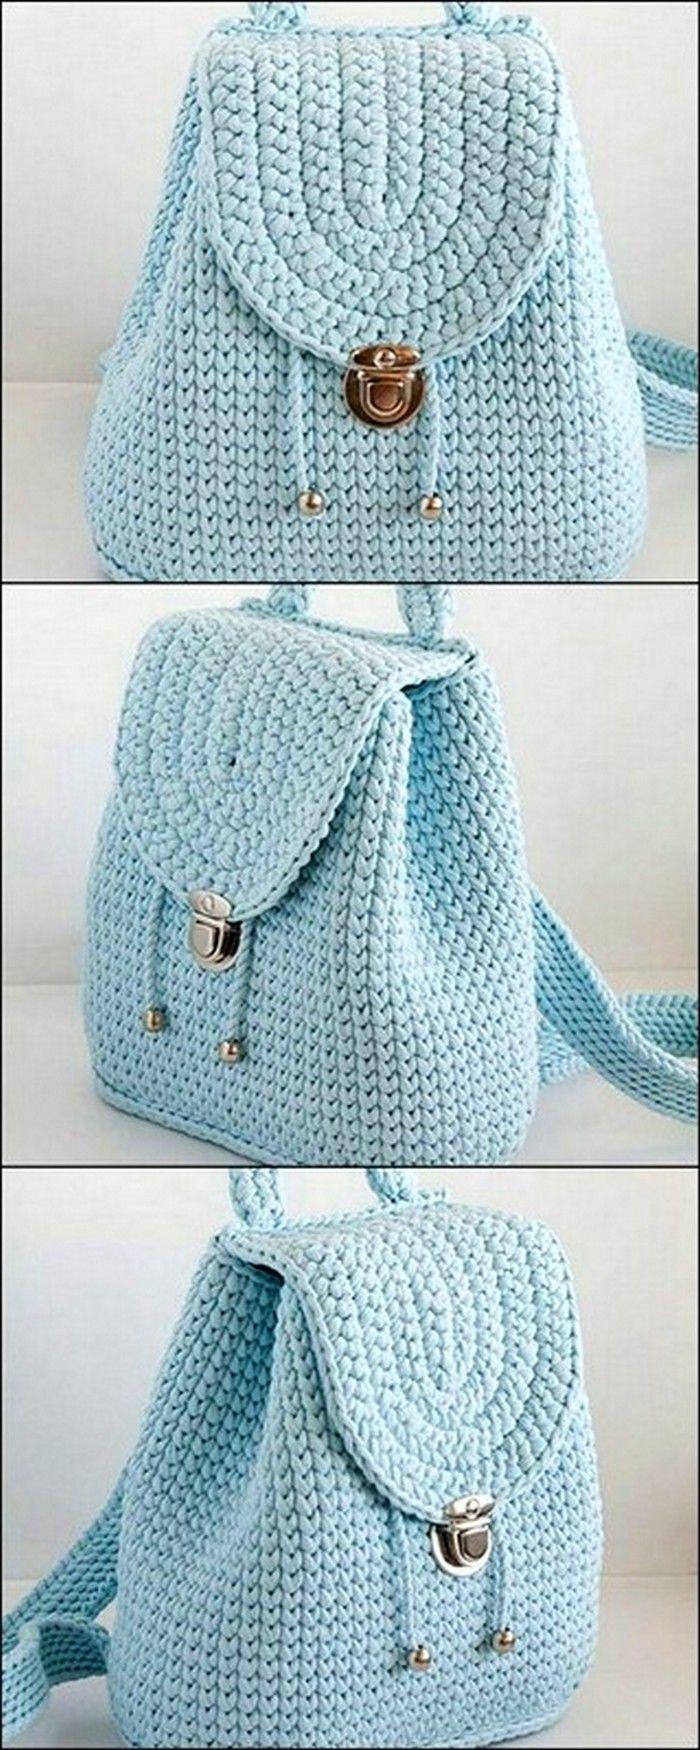 bricolage incroyable sac à main au crochet #amigurumi #crochet #knitting #amigurumipatterns #cr …   – Häkelanleitung